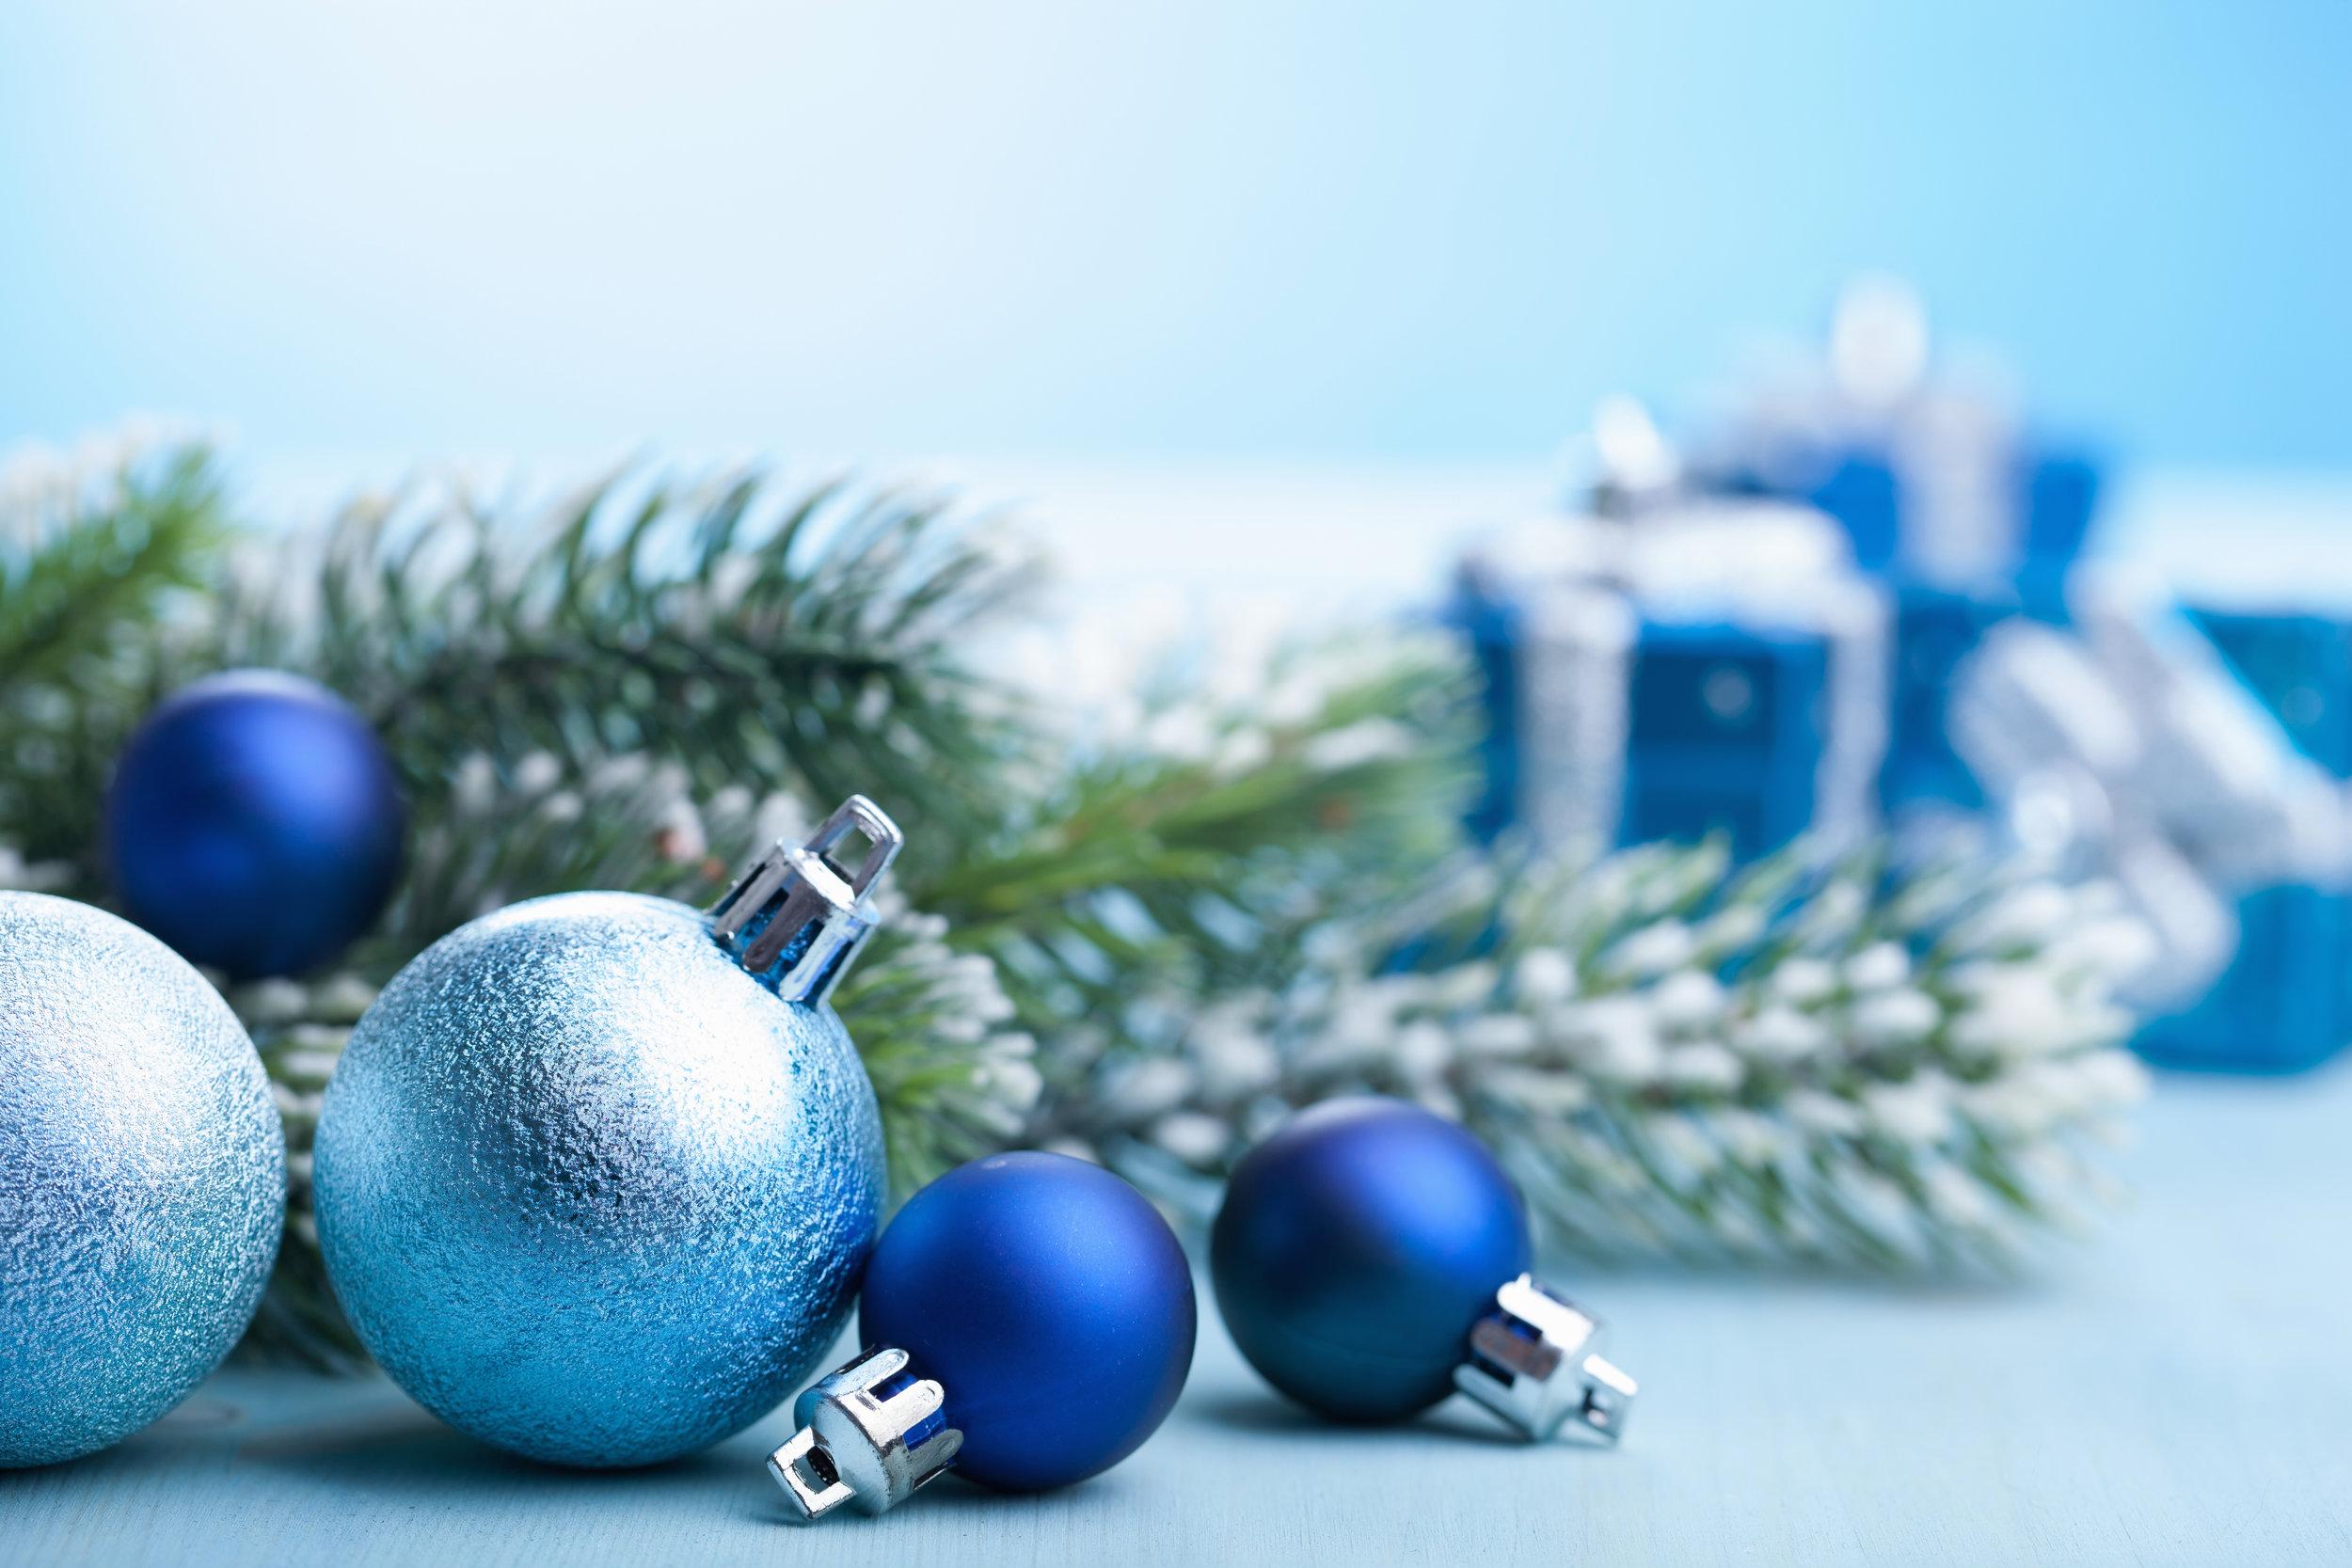 SPONSORS - The Prince Albert St Christmas Lights Committee wish to thank:MAJOR SPONSOR:McGrath MosmanSUPPORTING PARTNERS:Mosman Toyota and Mosman IGA